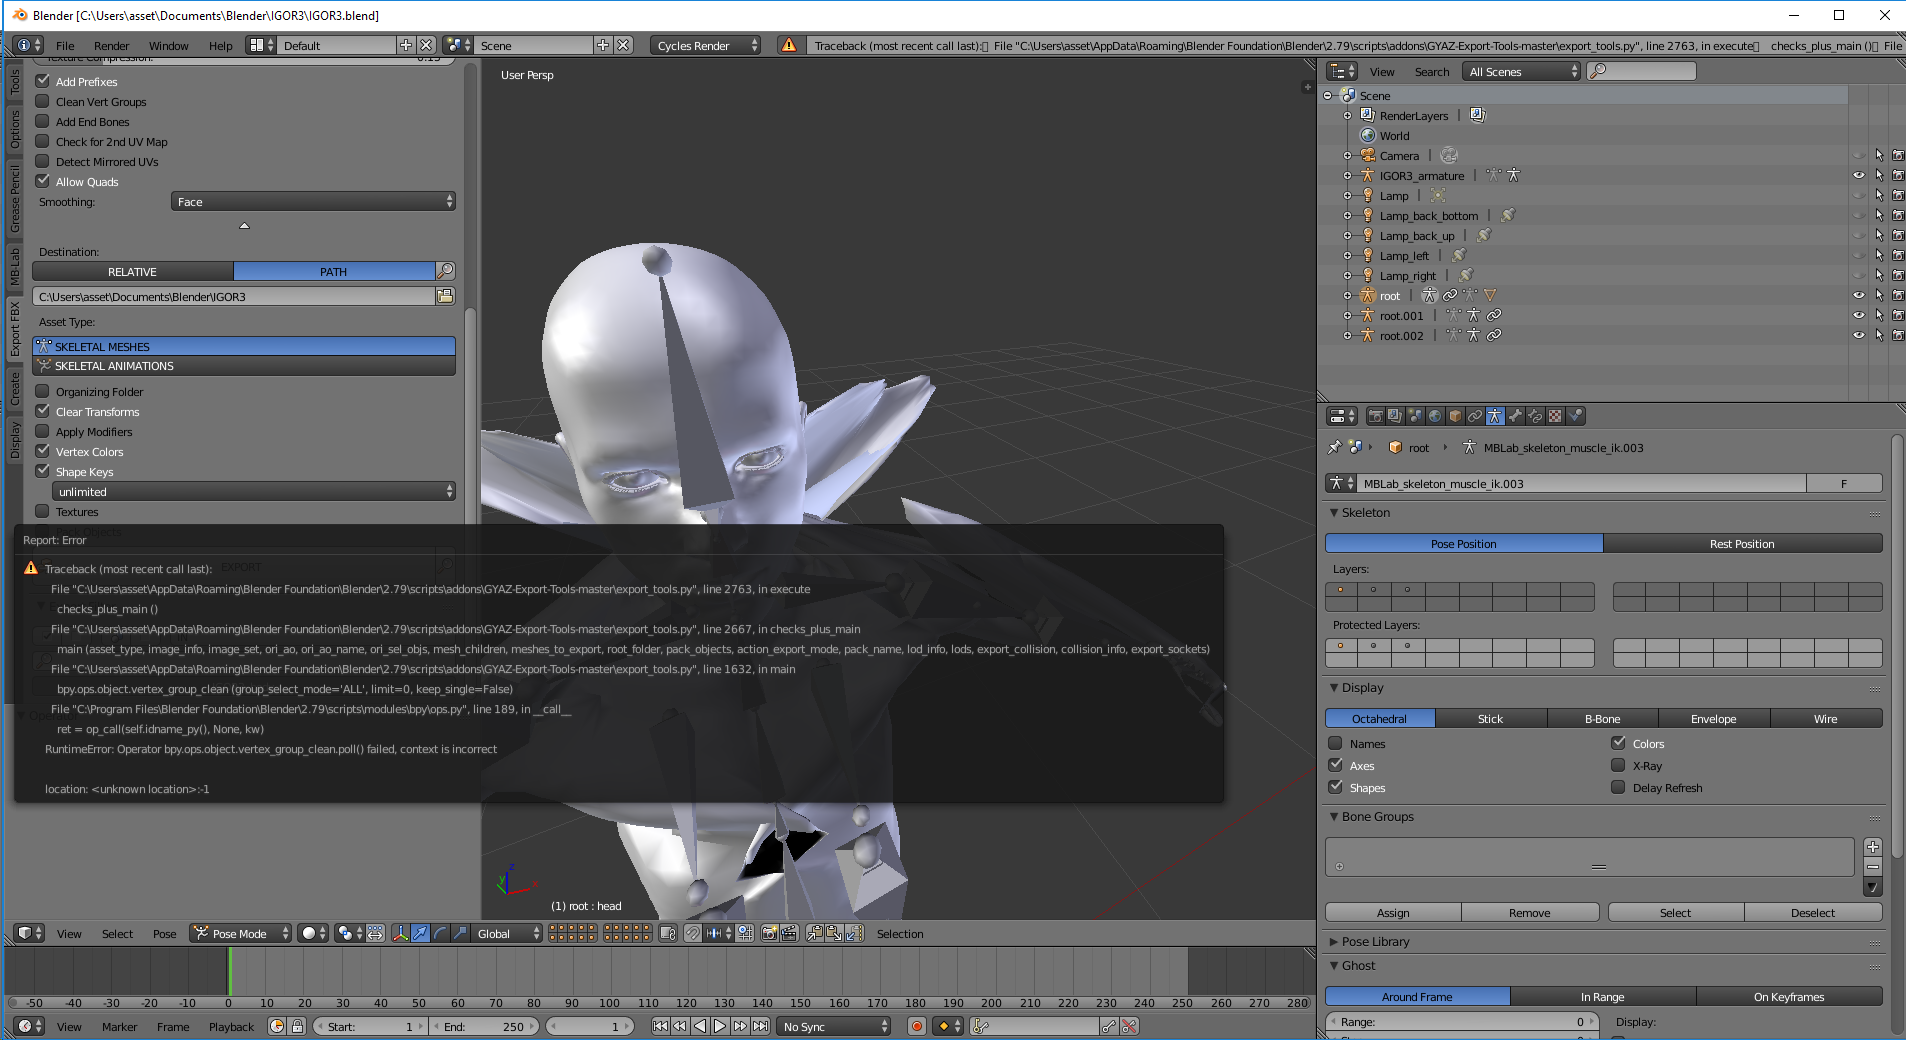 GYAZ Export Tools (Seamless Blender To Unreal 4 (FBX